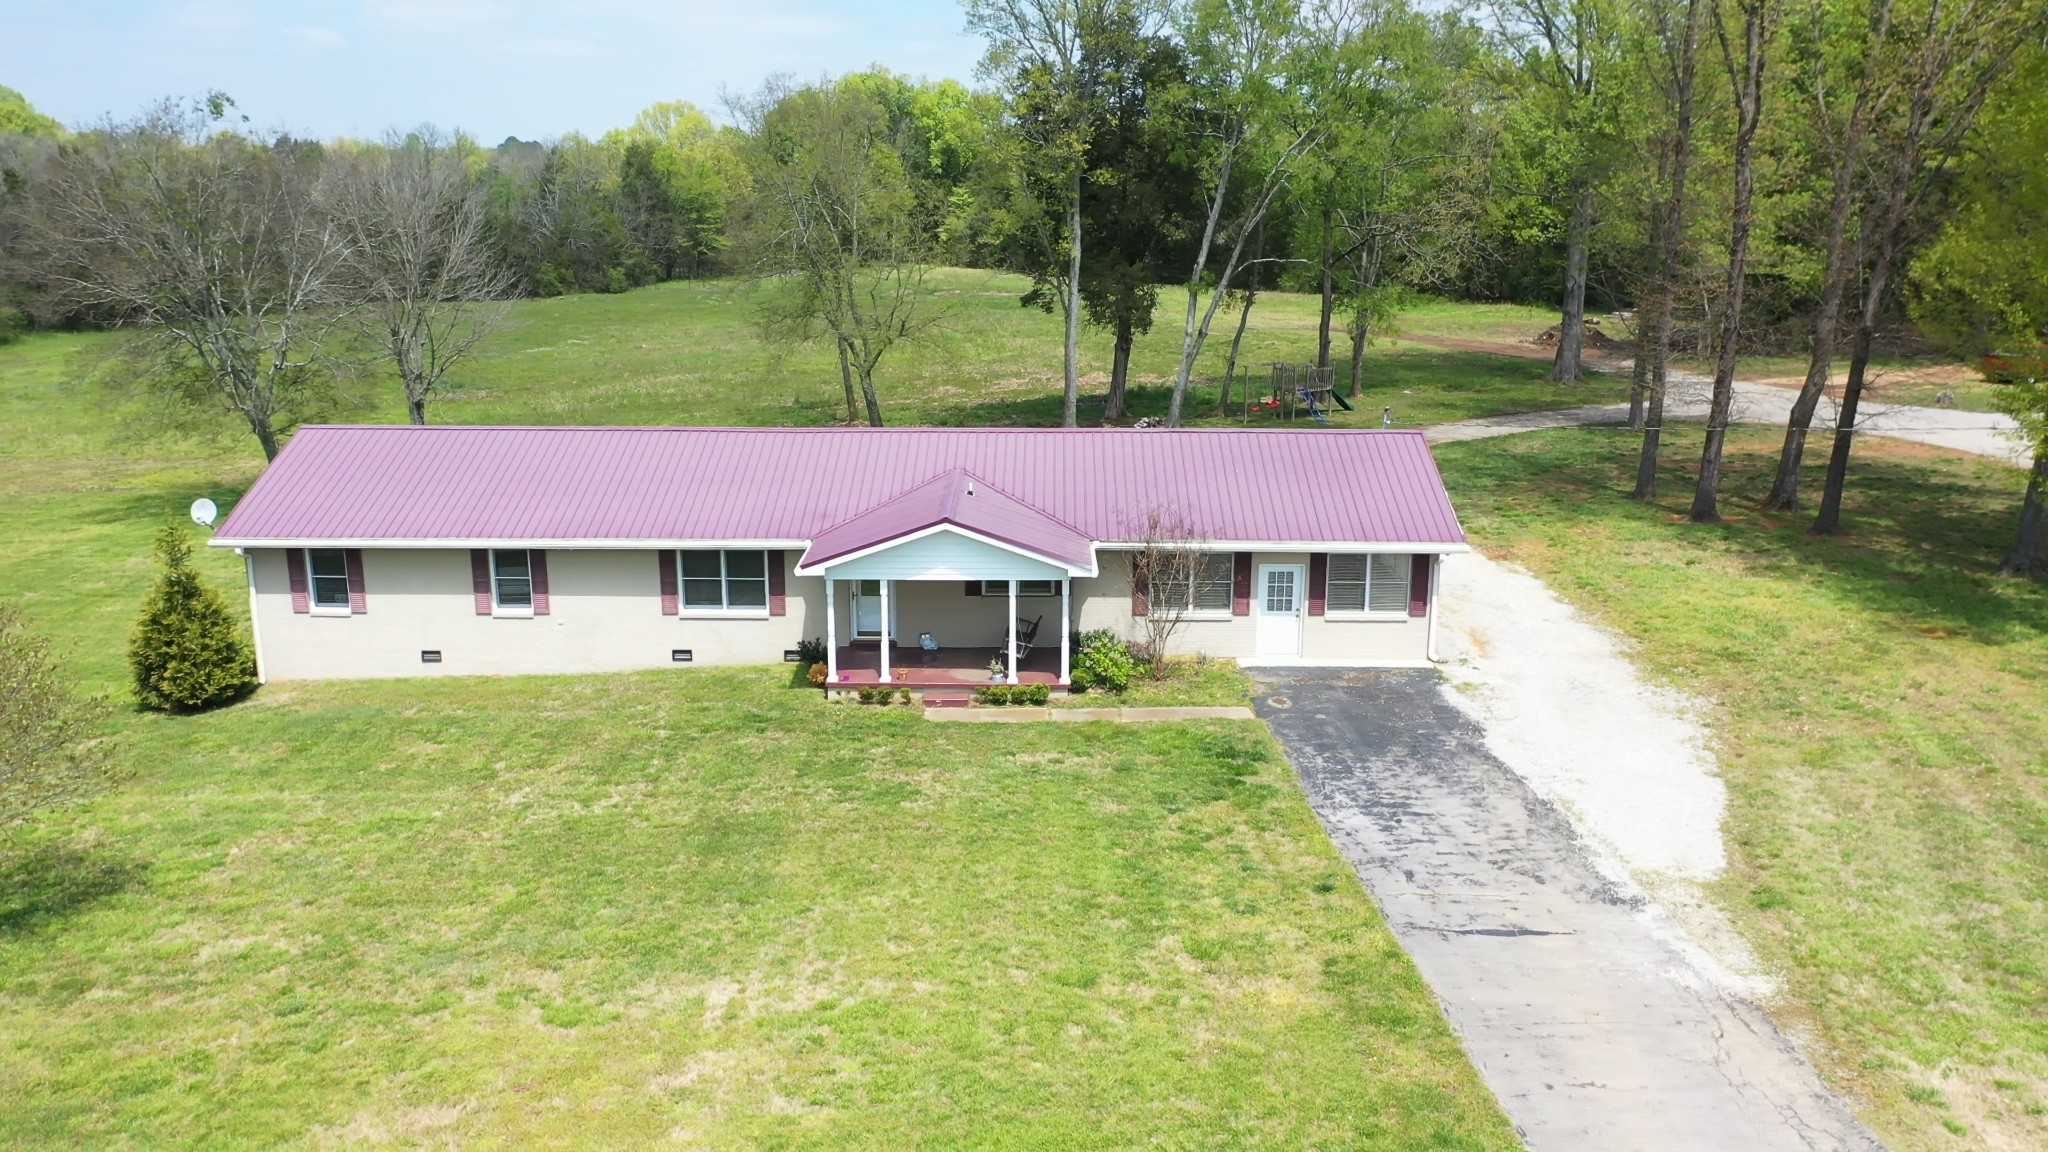 544 Old Columbia Rd, Unionville, TN 37180 - Unionville, TN real estate listing